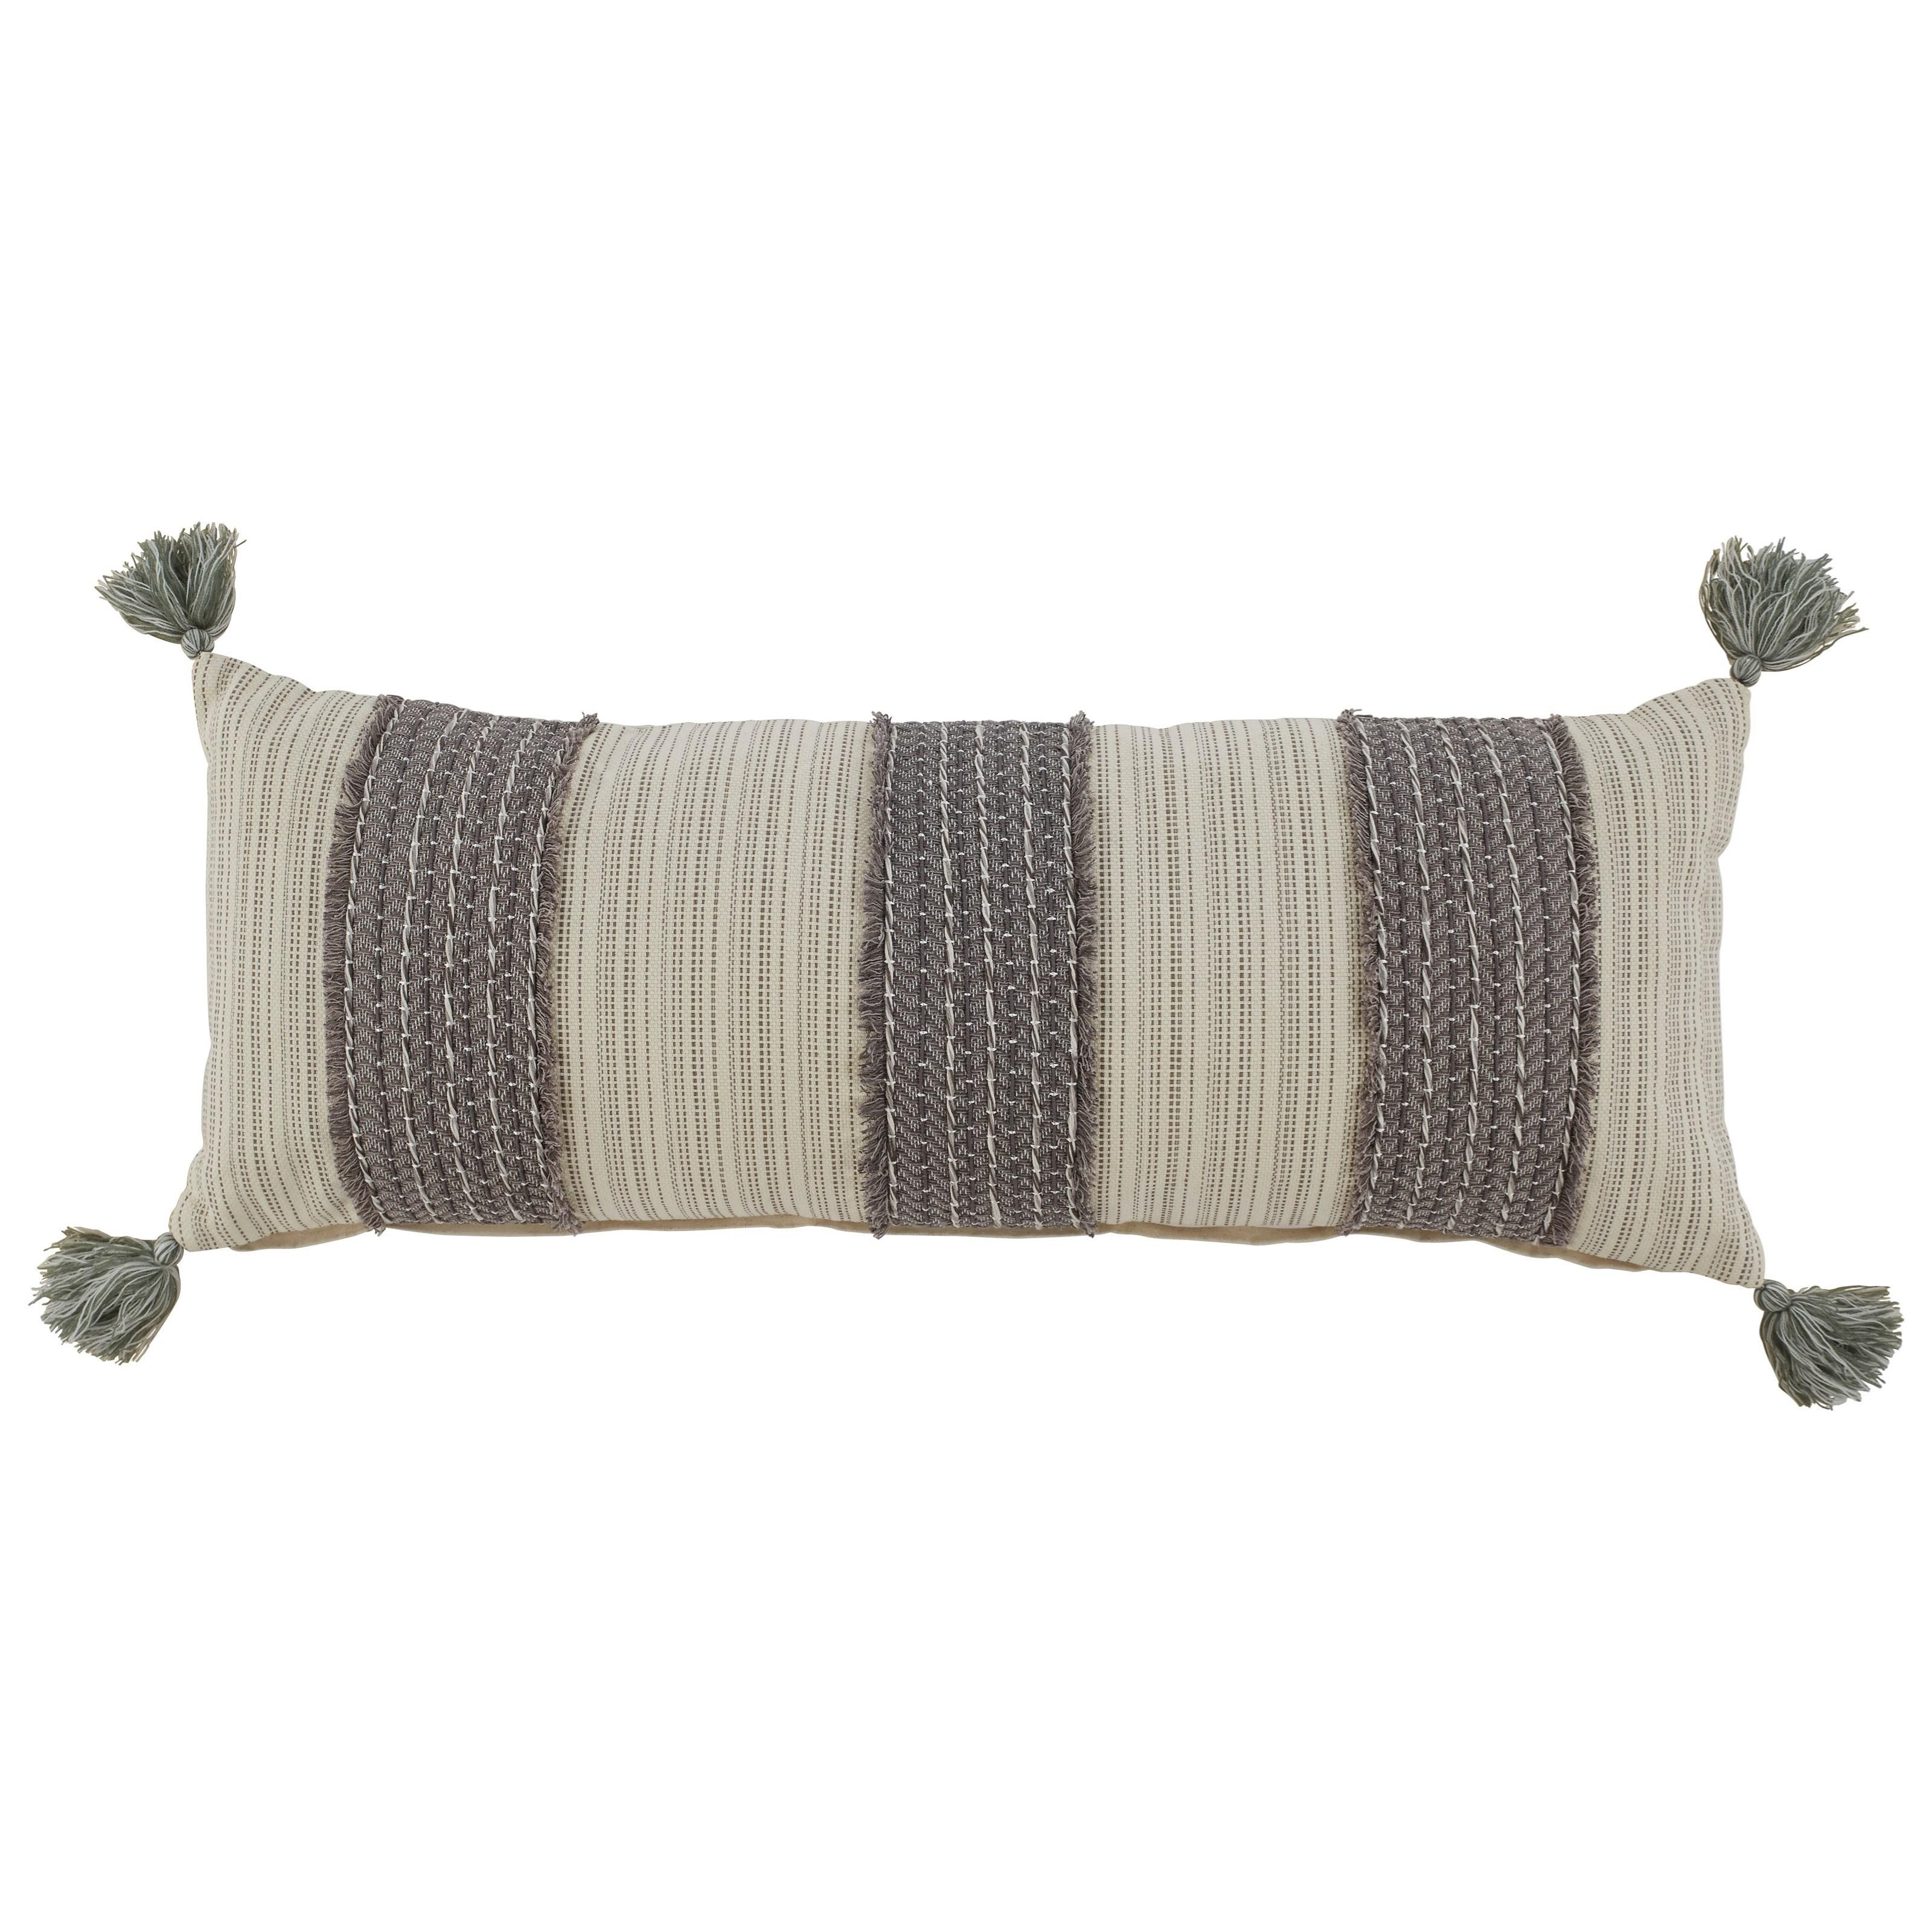 Linwood Gray/Cream Pillow